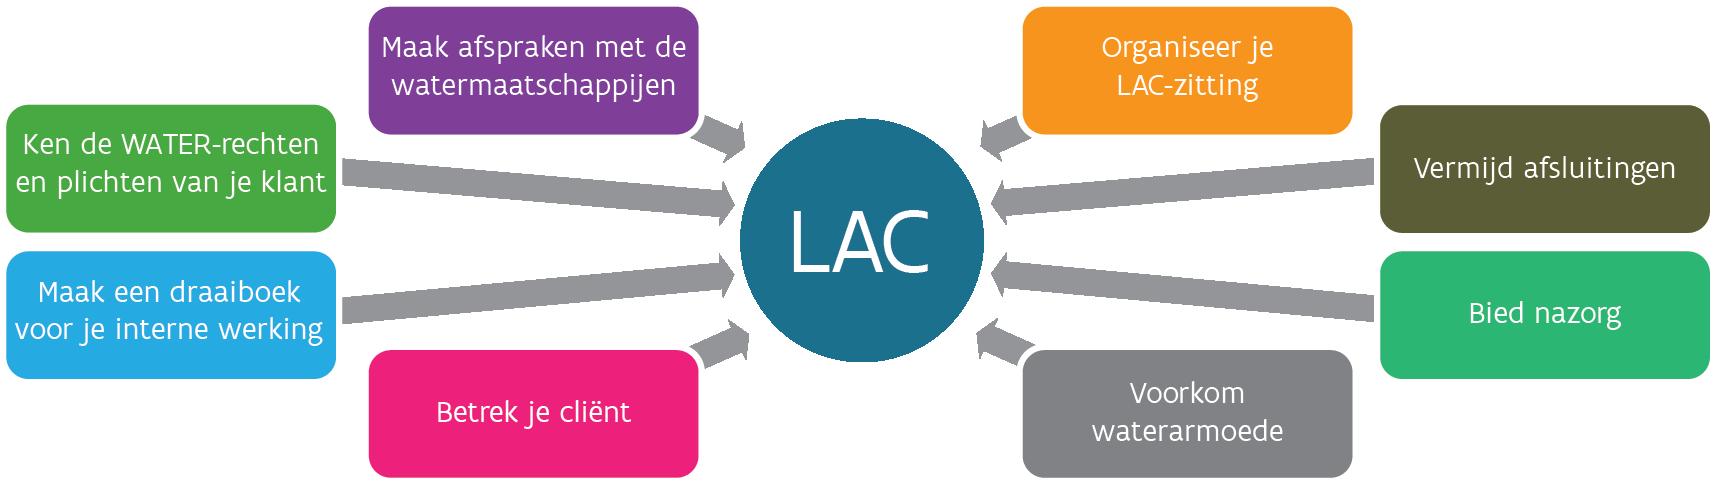 Afbeelding aandachtspunten LAC water